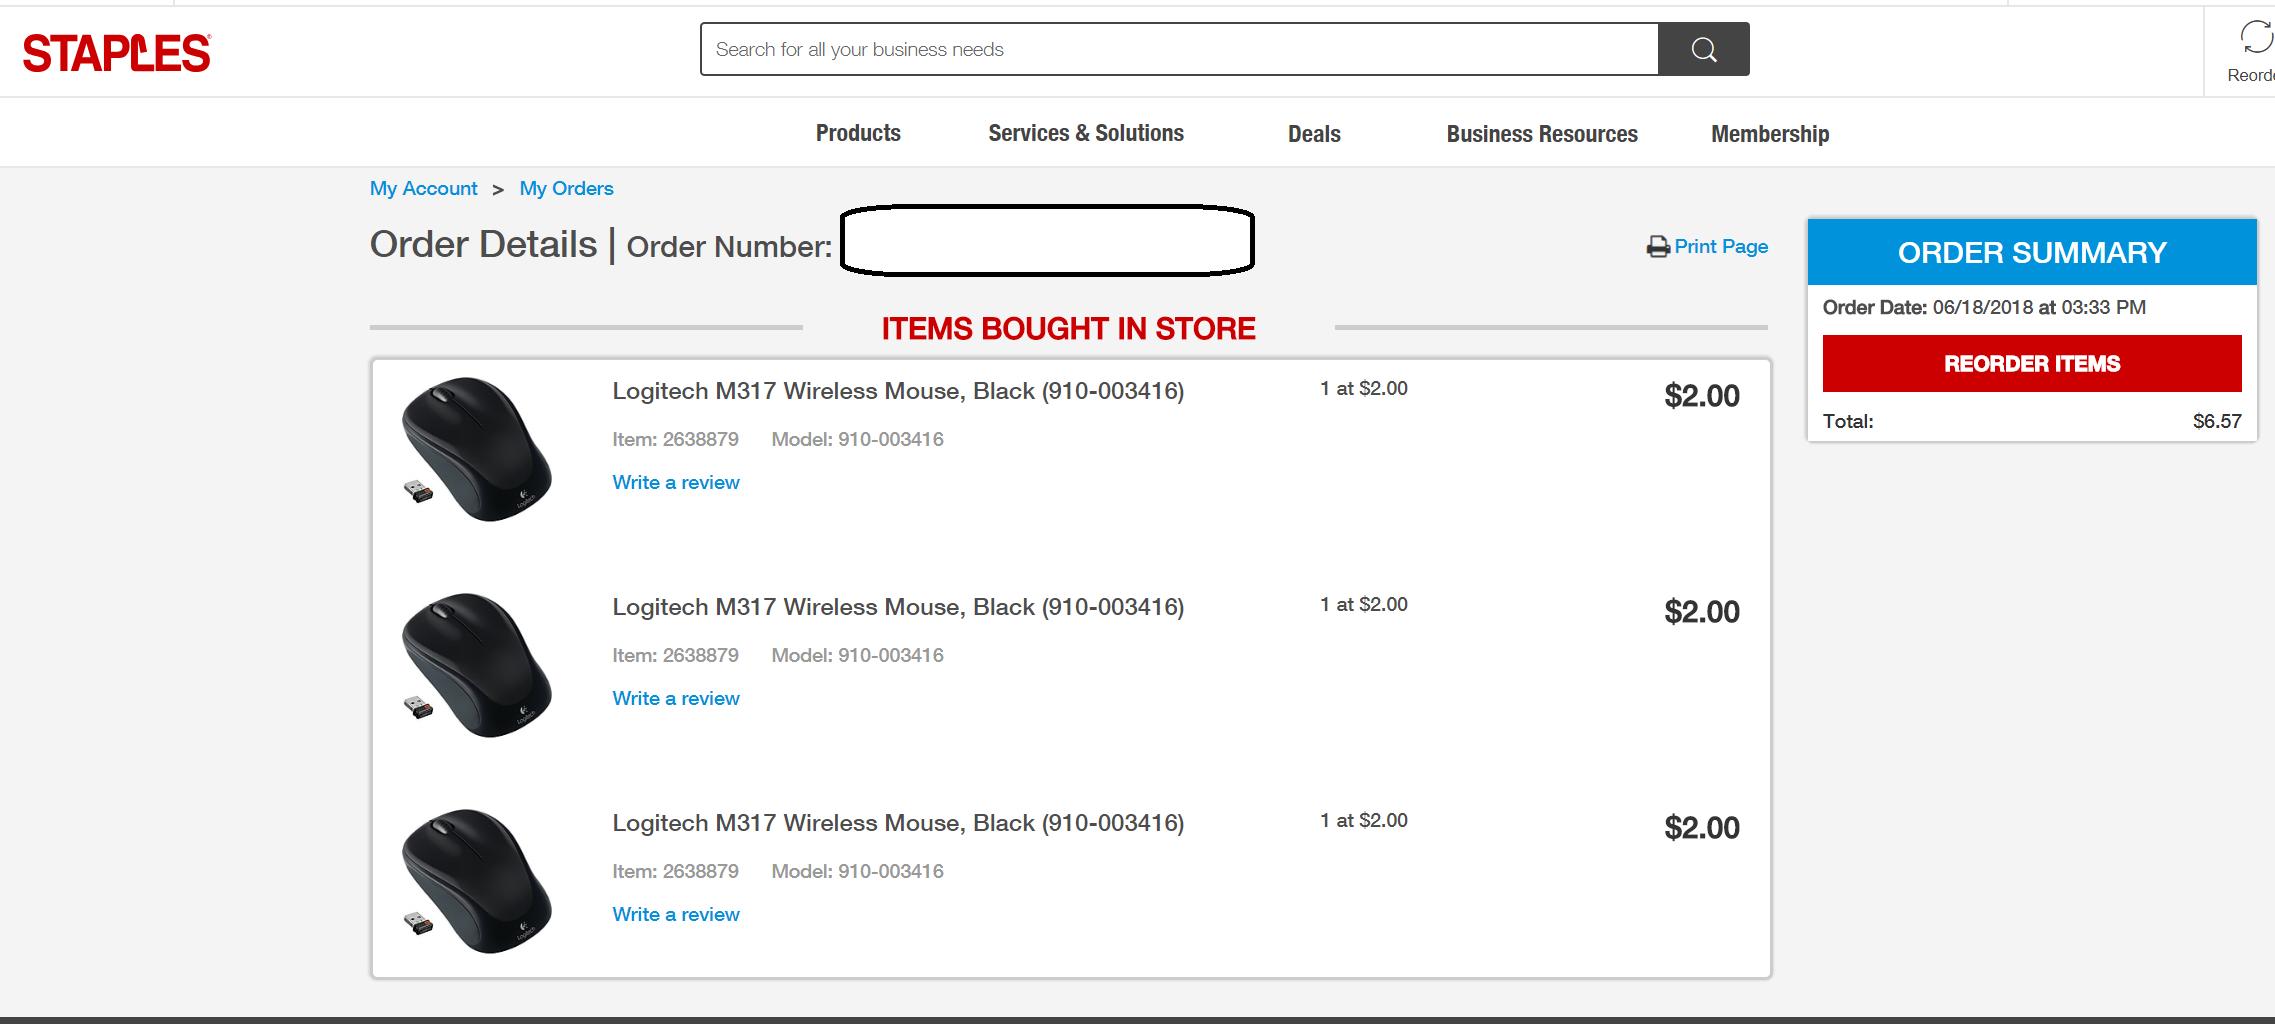 Logitech M317 Wireless Mouse $2 @Staples in Store YMMV